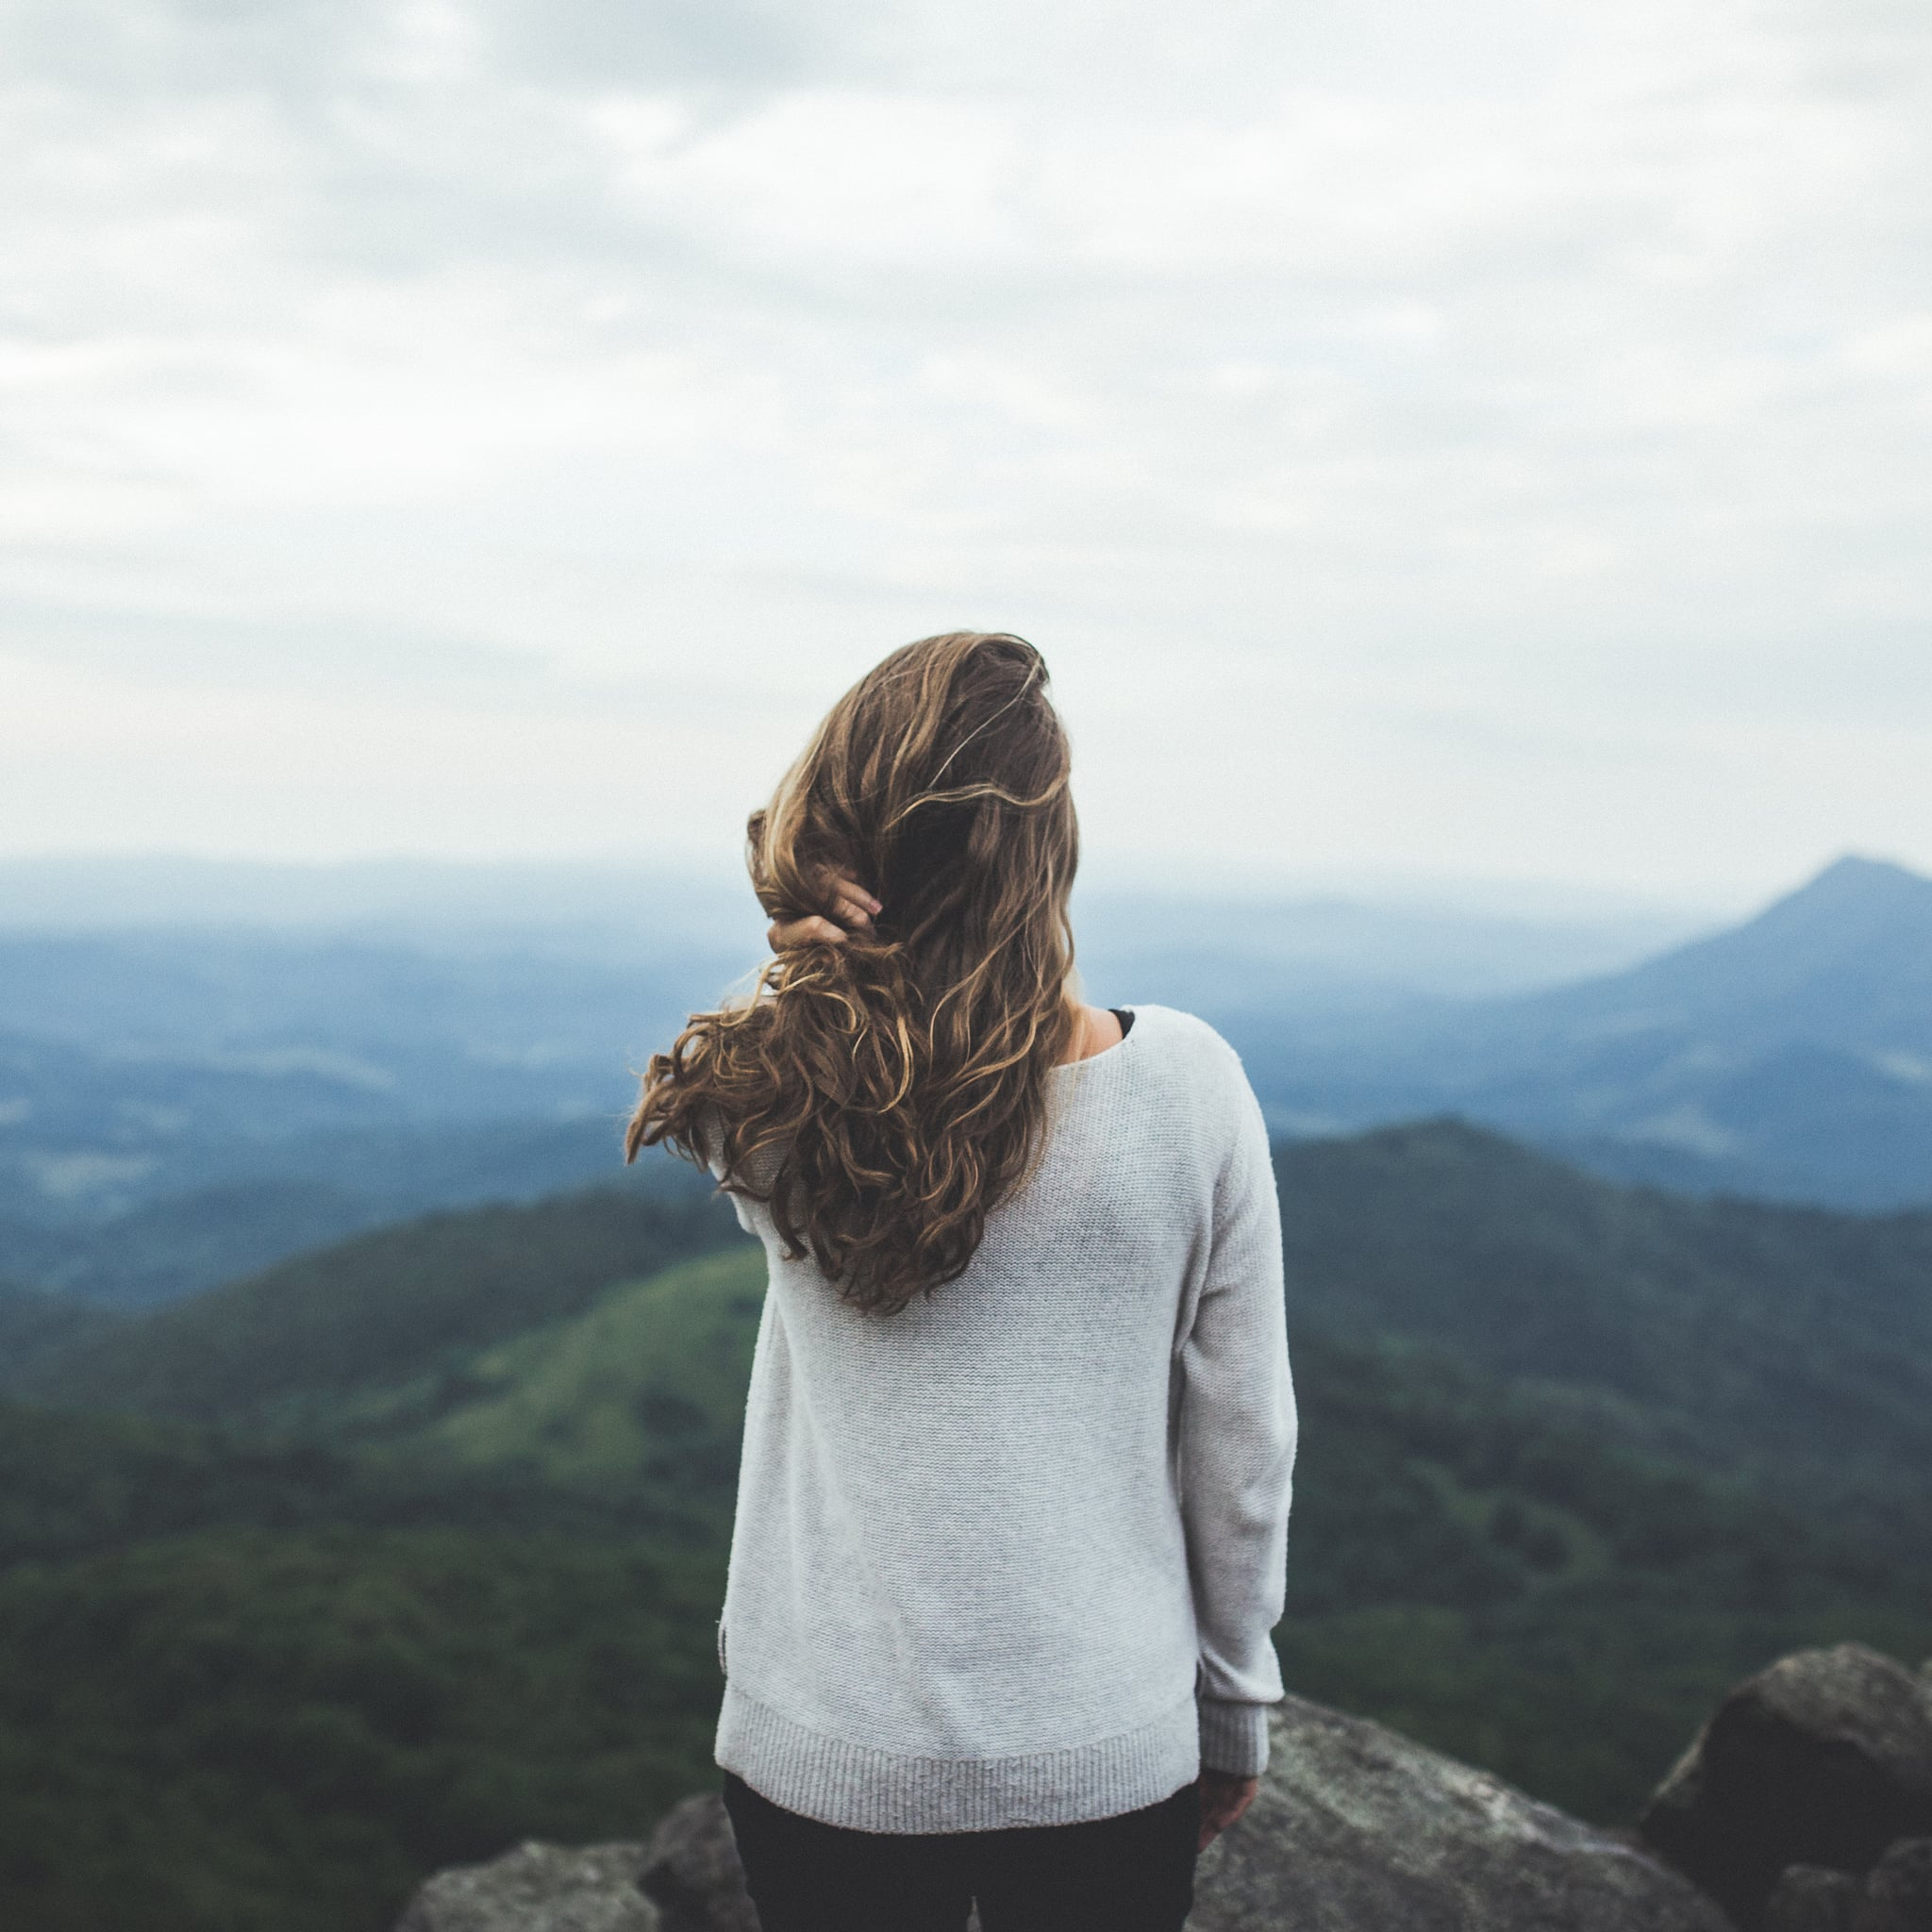 How Women Experience PTSD | POPSUGAR Fitness